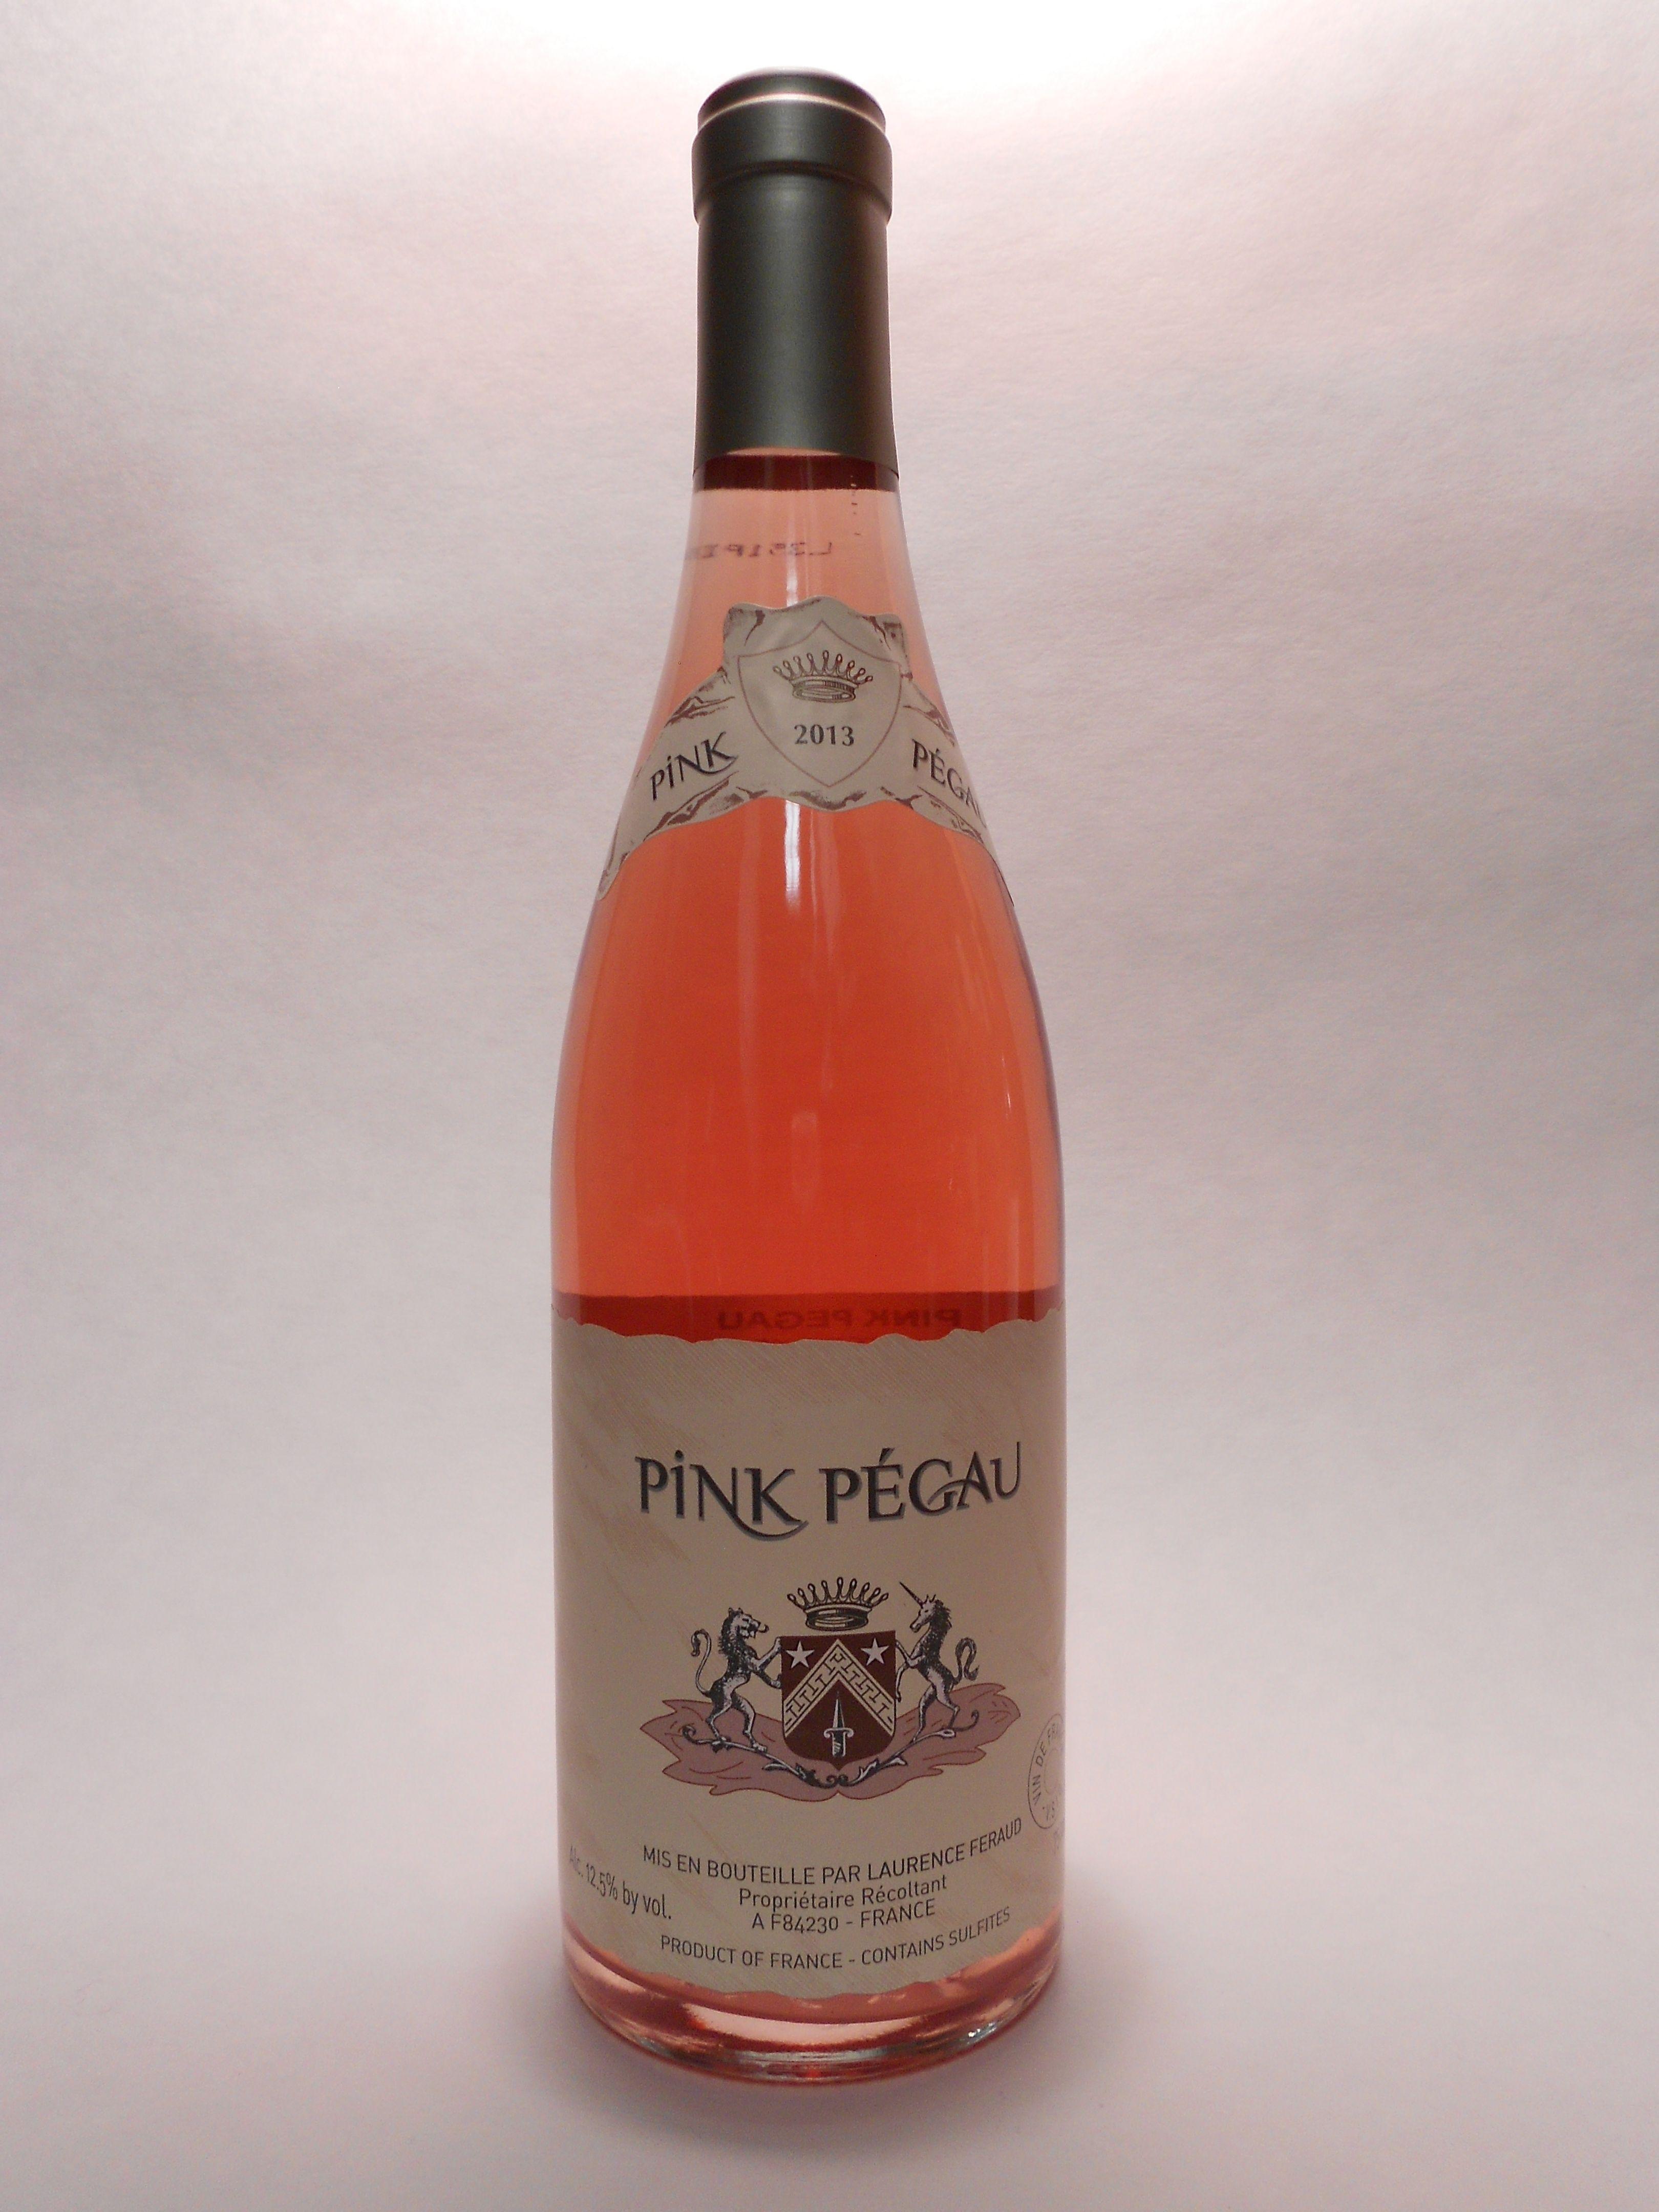 2013 Pegau Vdf Rose Pink Pegau Sku 61796 Www Bassins Com Phone 202 338 1433 Vino Rosado Vinos